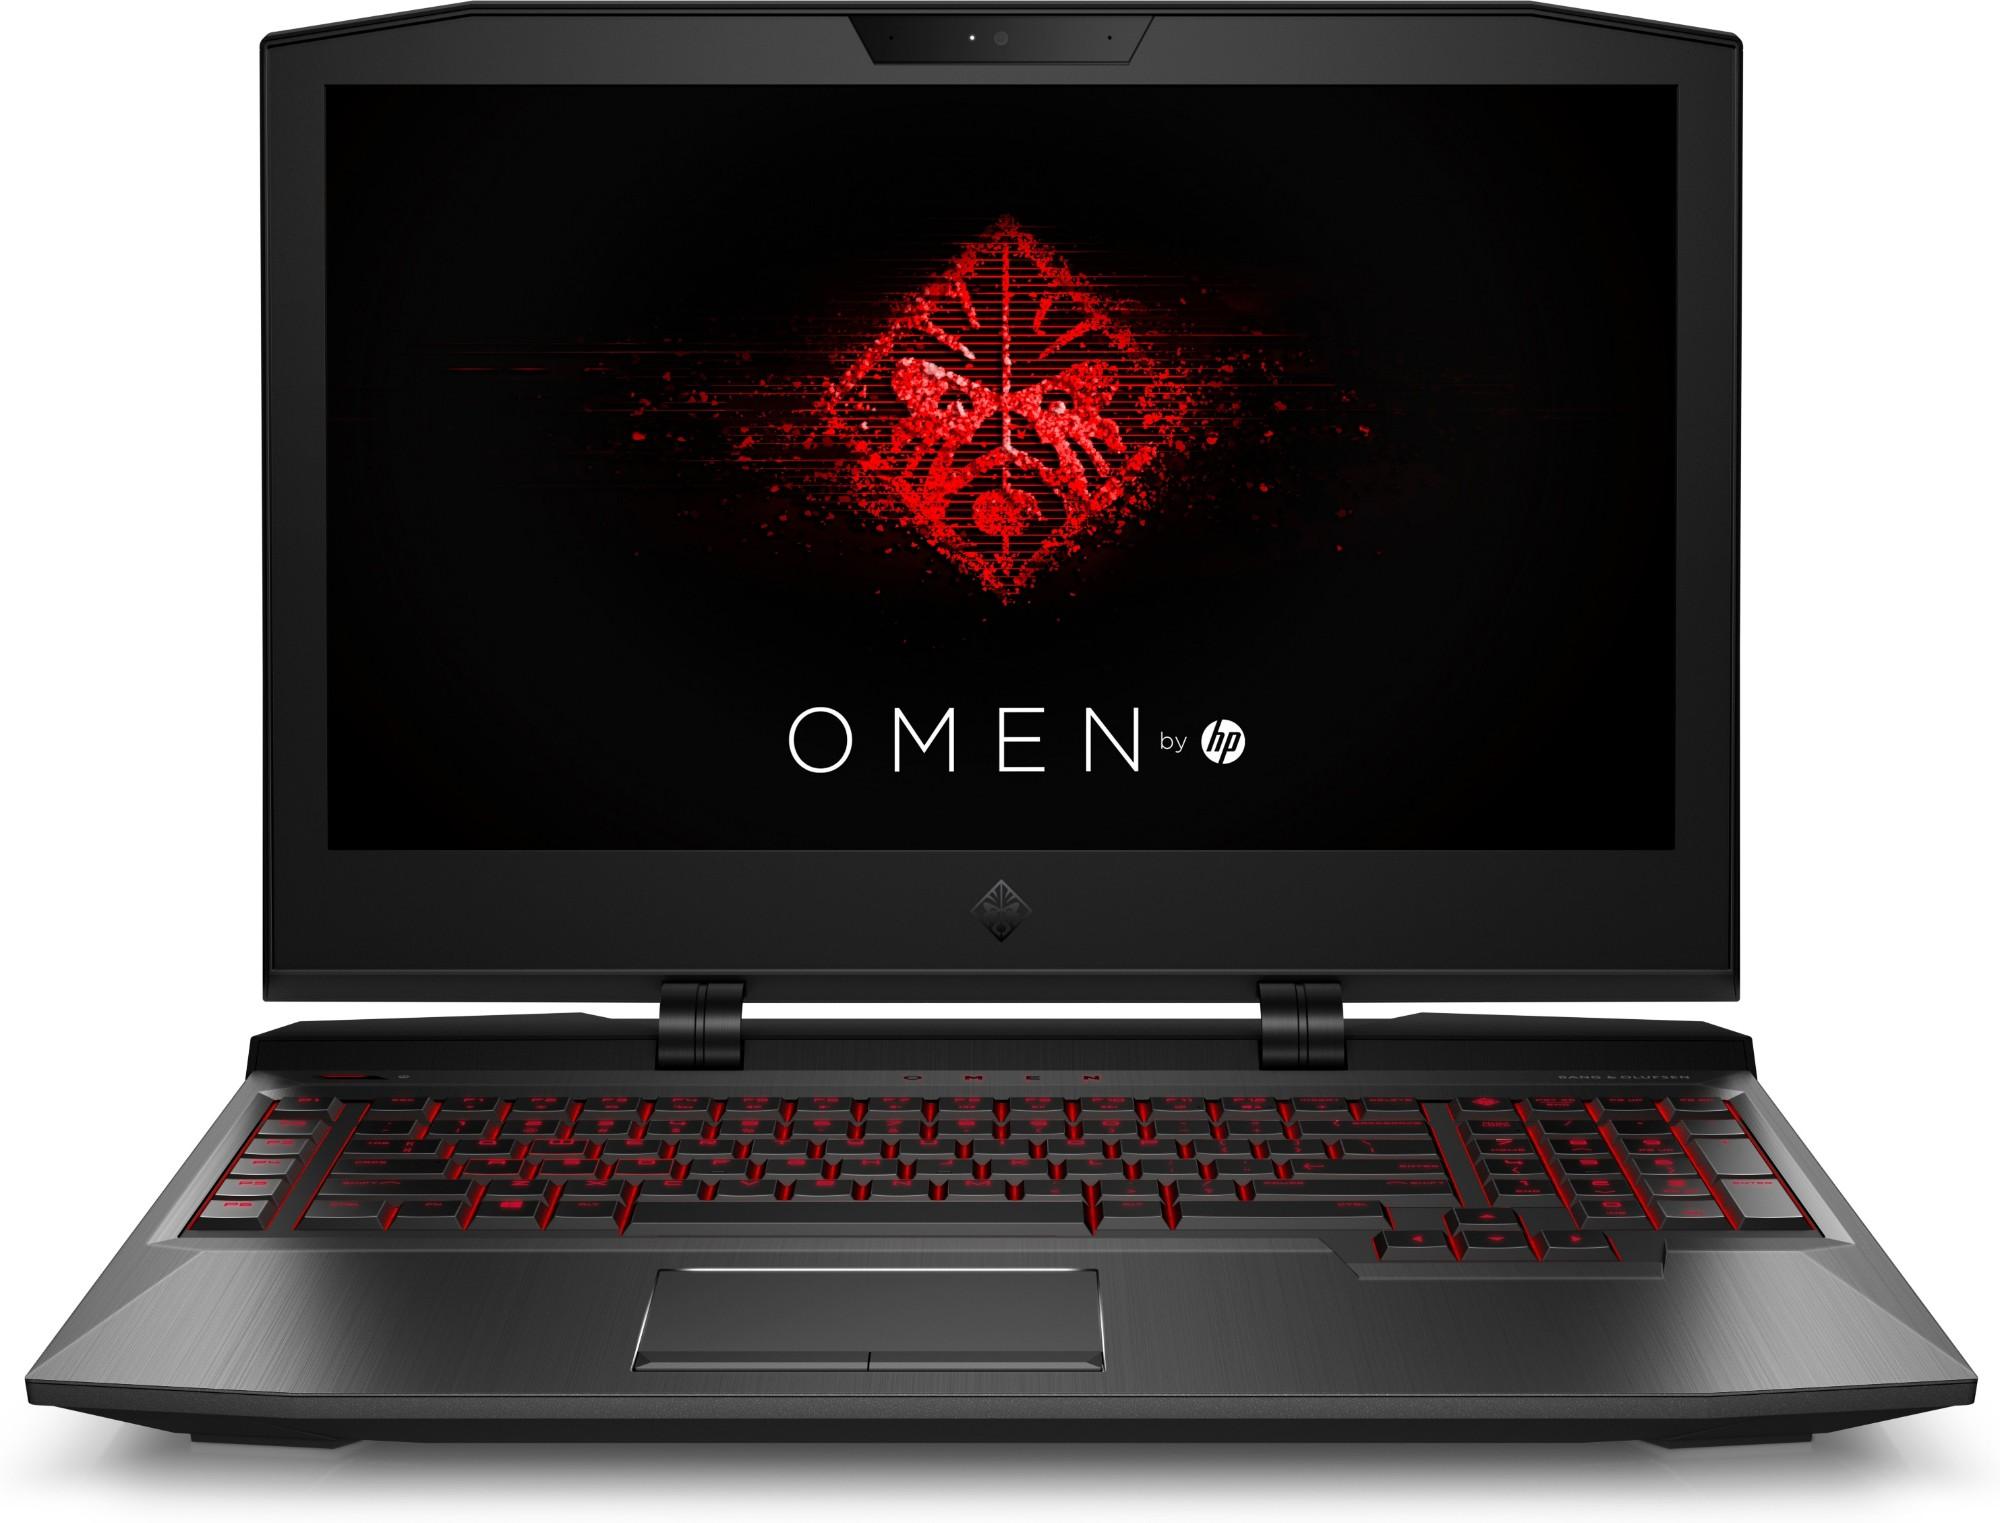 OMEN X by HP 17-ap000na - i7 7820HK - 16GB RAM - 256GB SSD - 1TB HDD - Win10 home